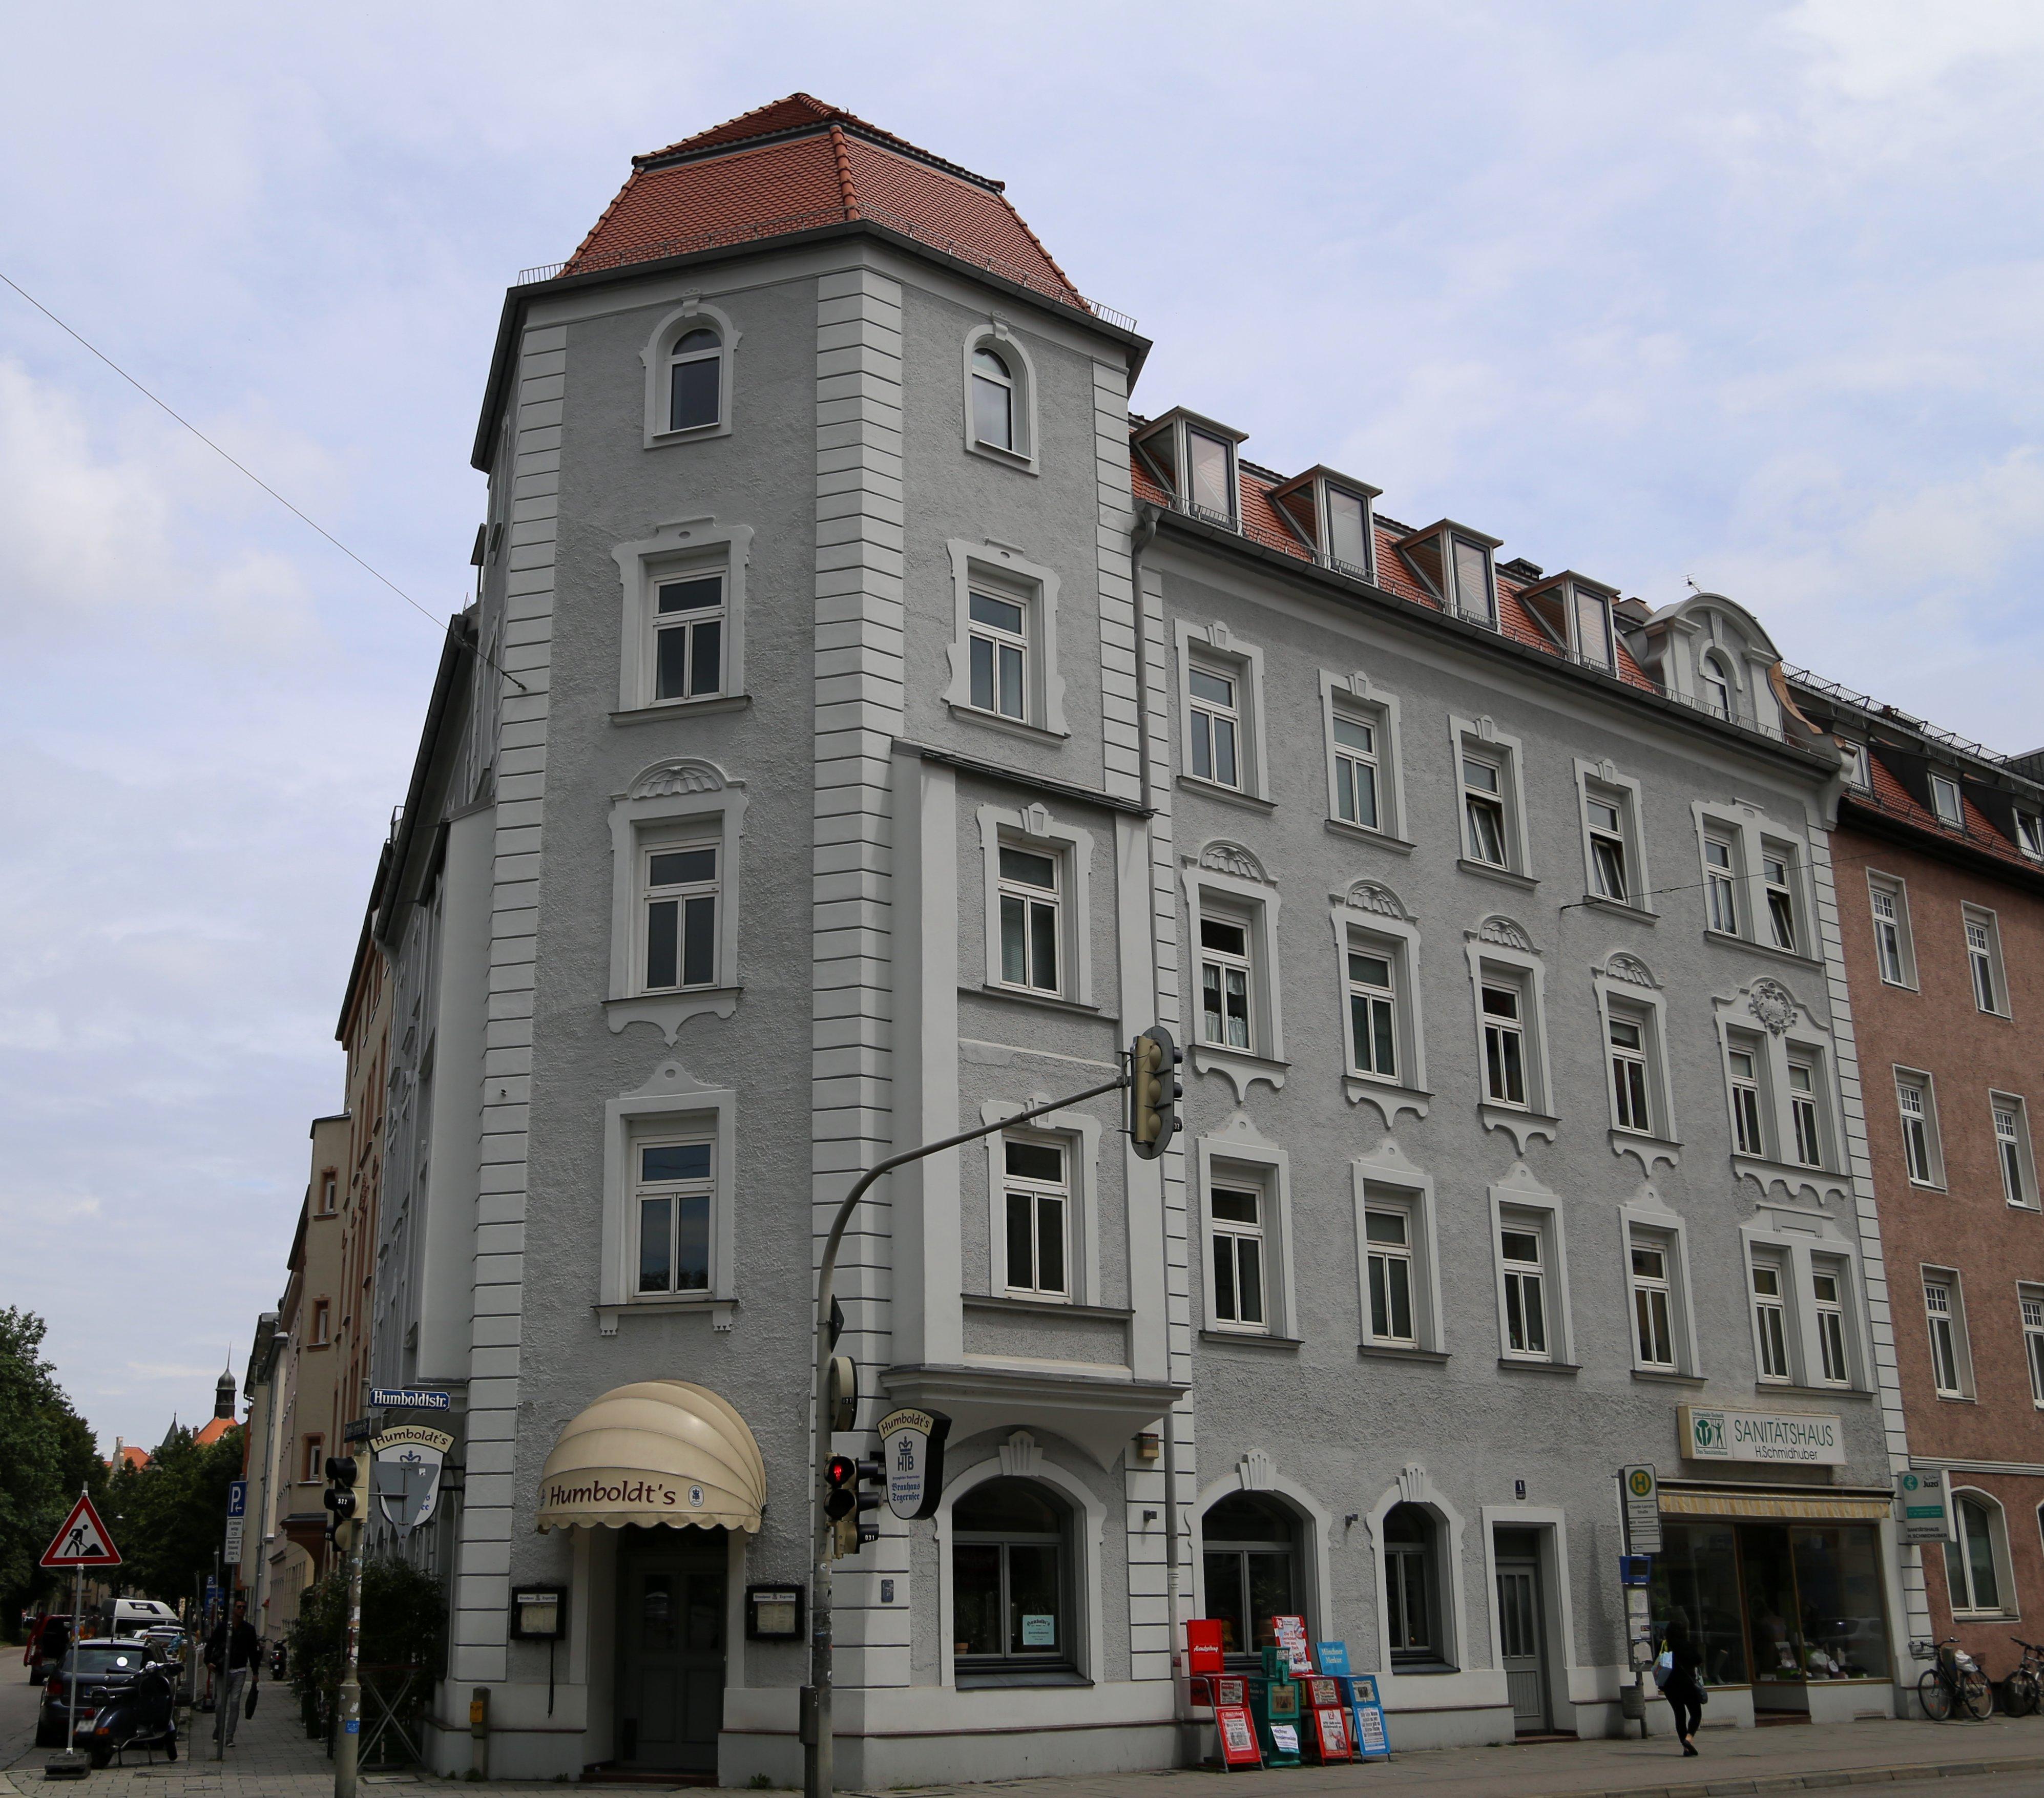 Humboldtstr München file humboldtstr 1 muenchen 2 jpg wikimedia commons